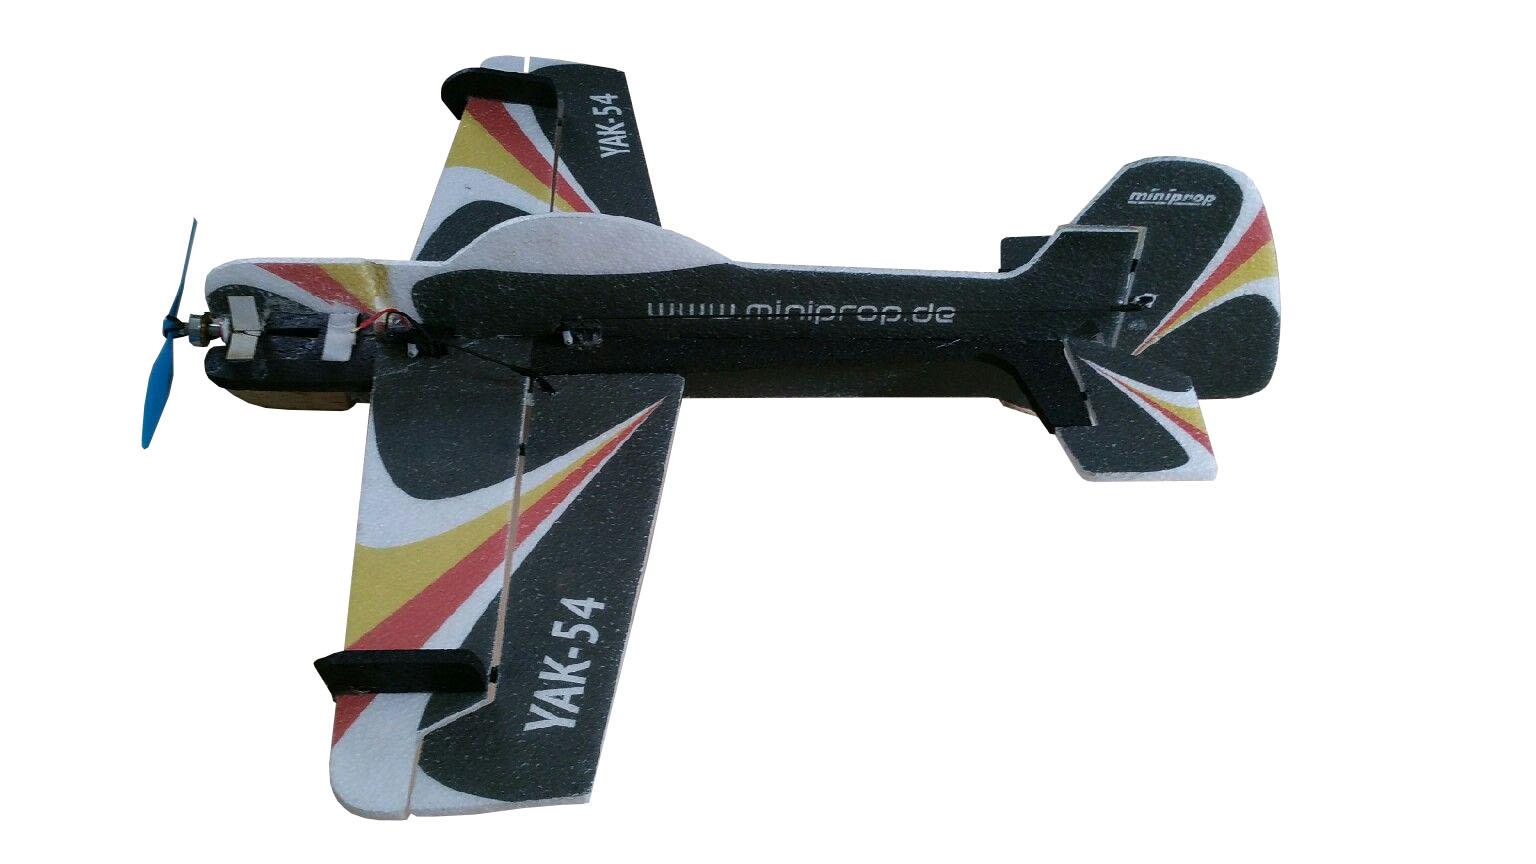 Yak 54 miniprop